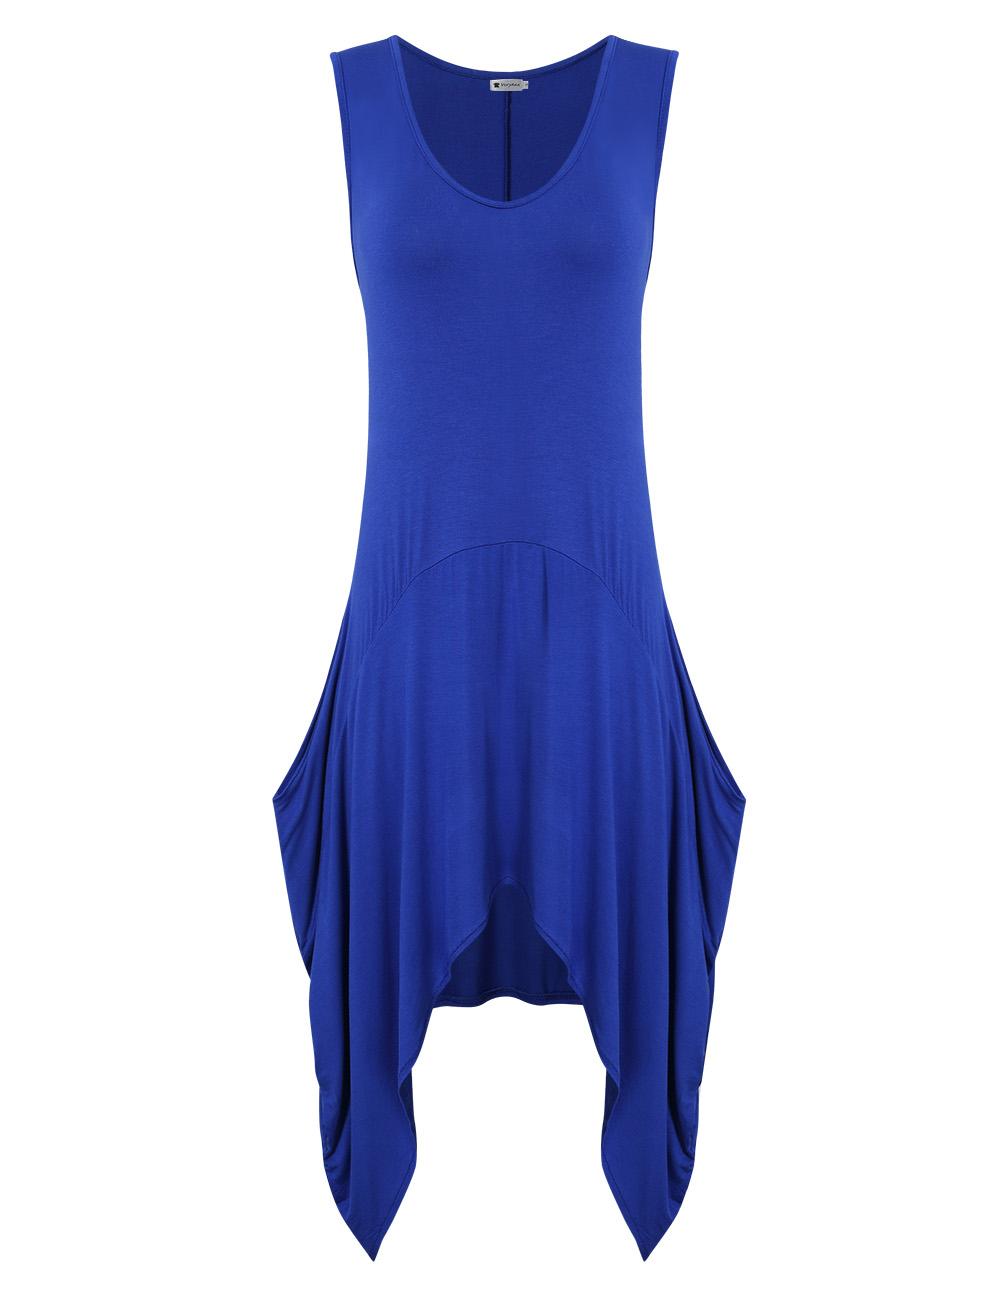 [US Direct] VeryAnn Women's Round Neck Knee-length Loose T-shirt Dress Casual Sleeveless Dress